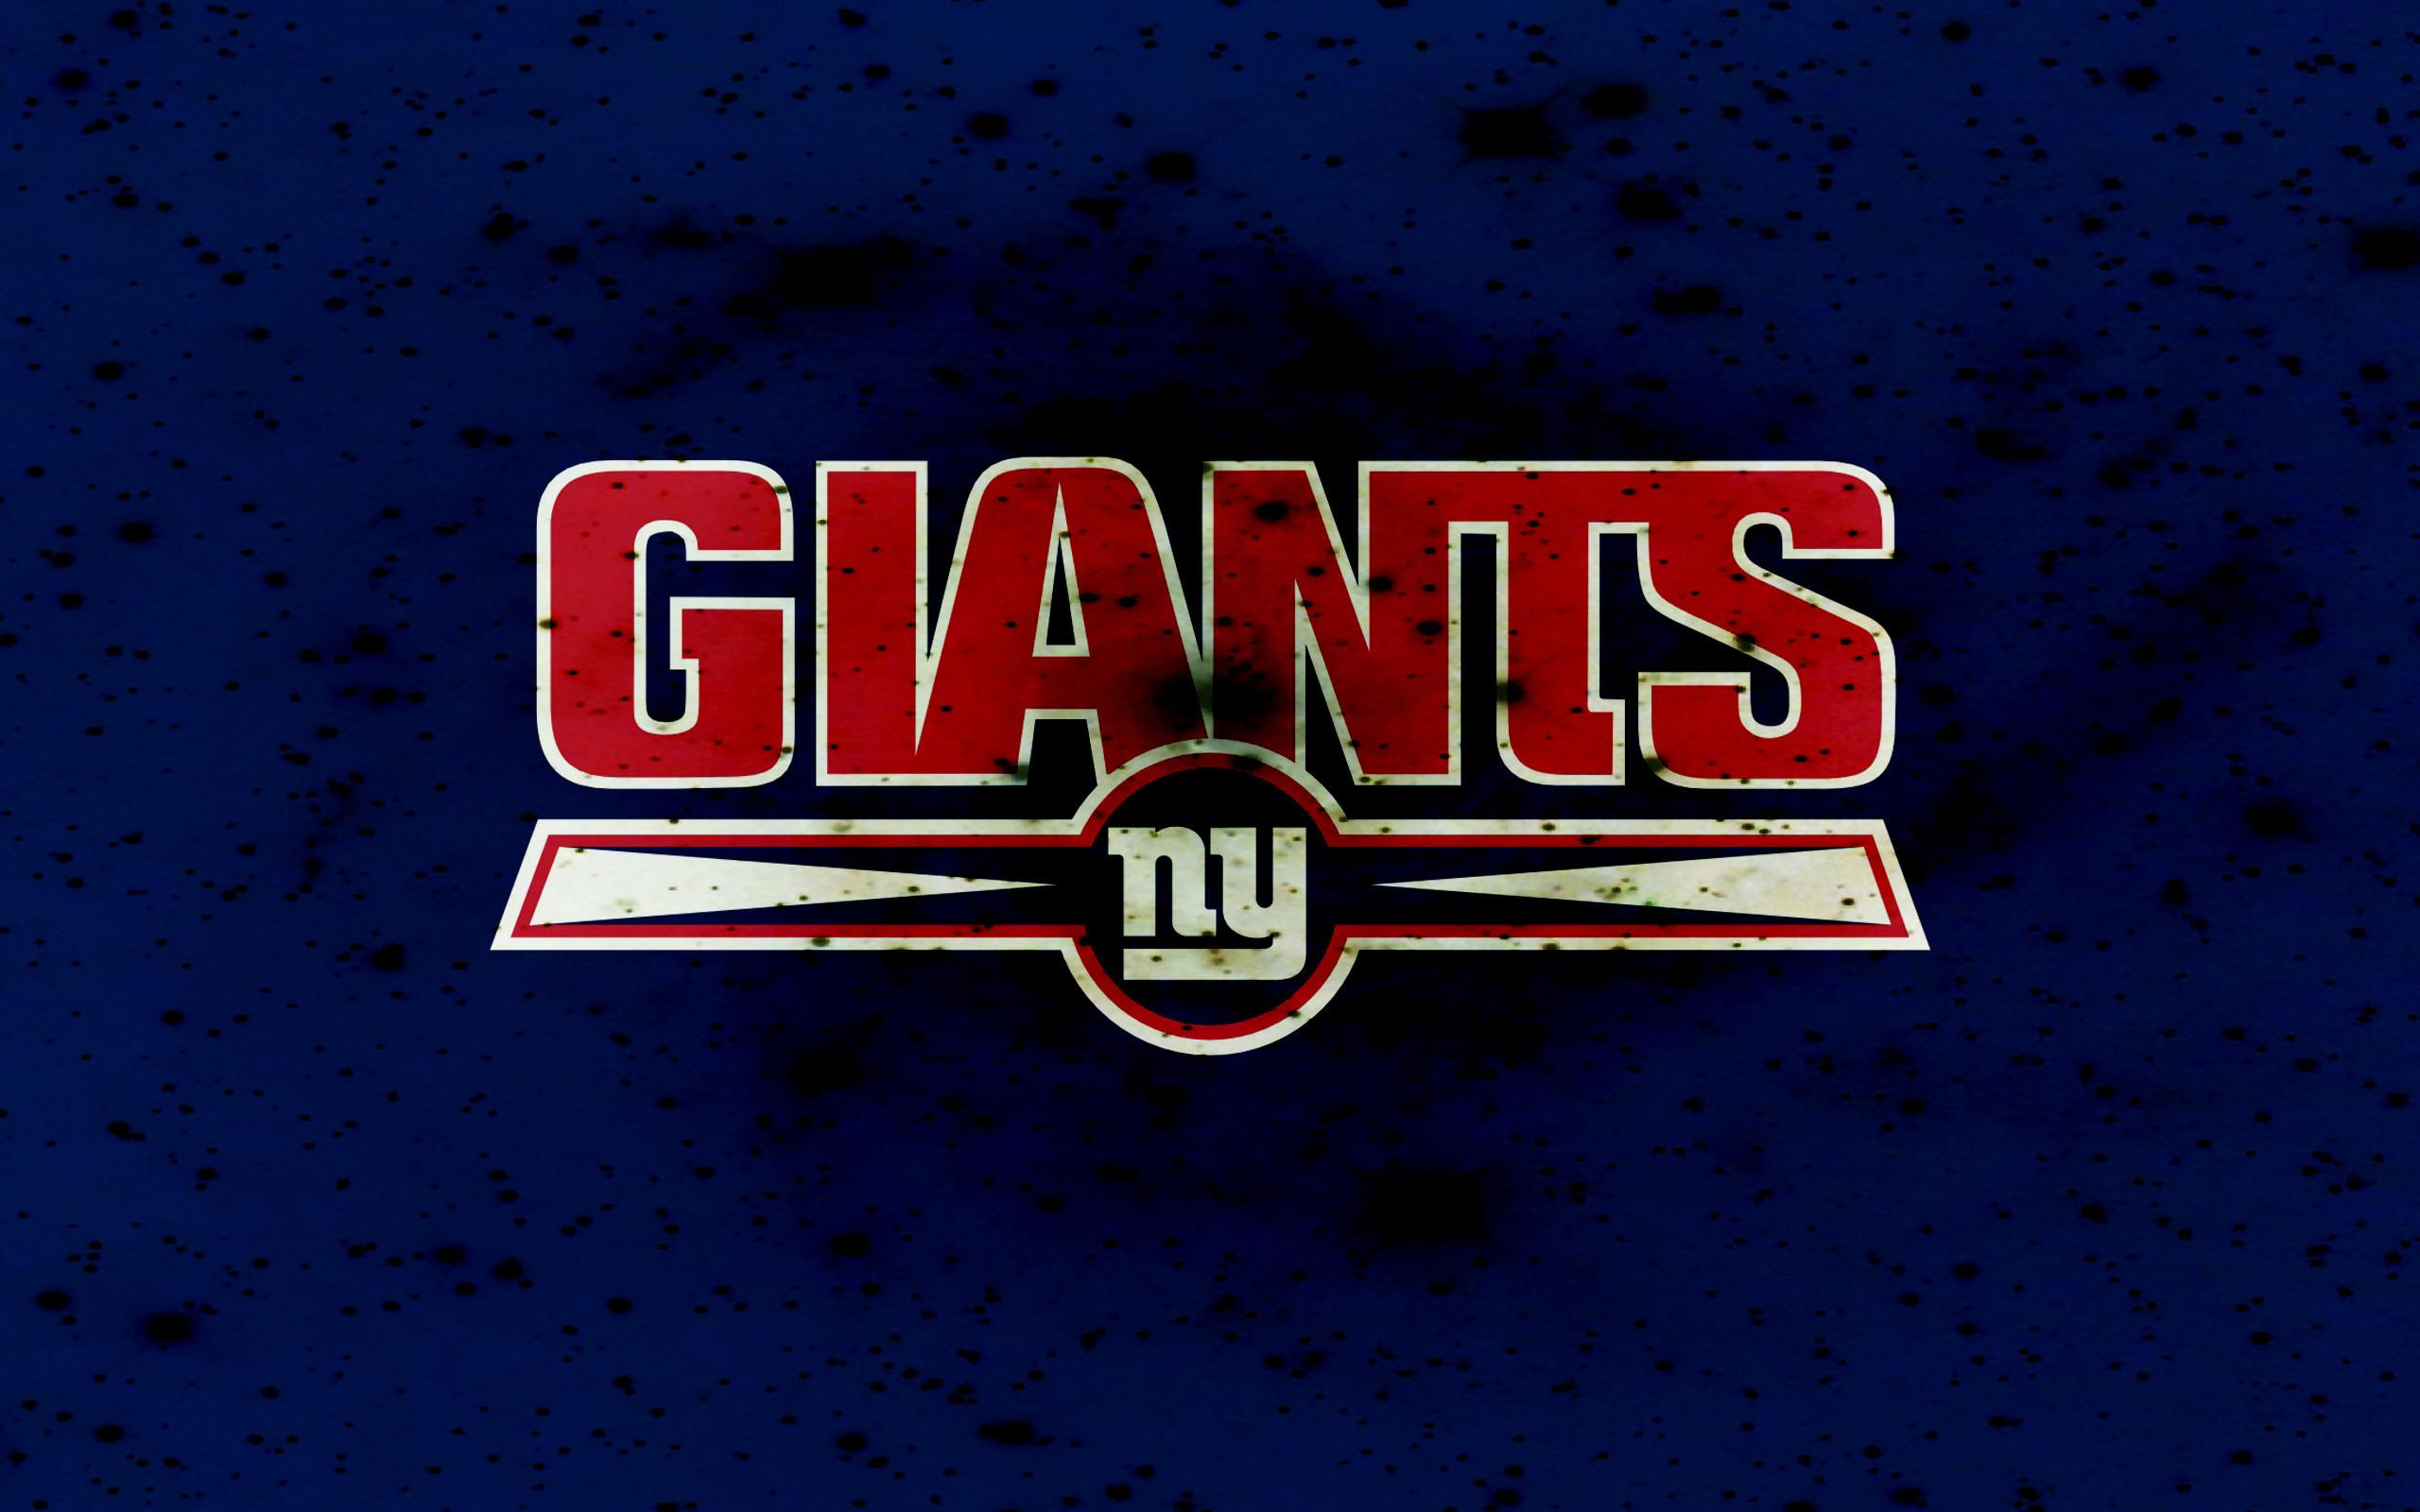 NFL Backgrounds | HD Wallpapers | Pinterest | Hd wallpaper and Wallpaper